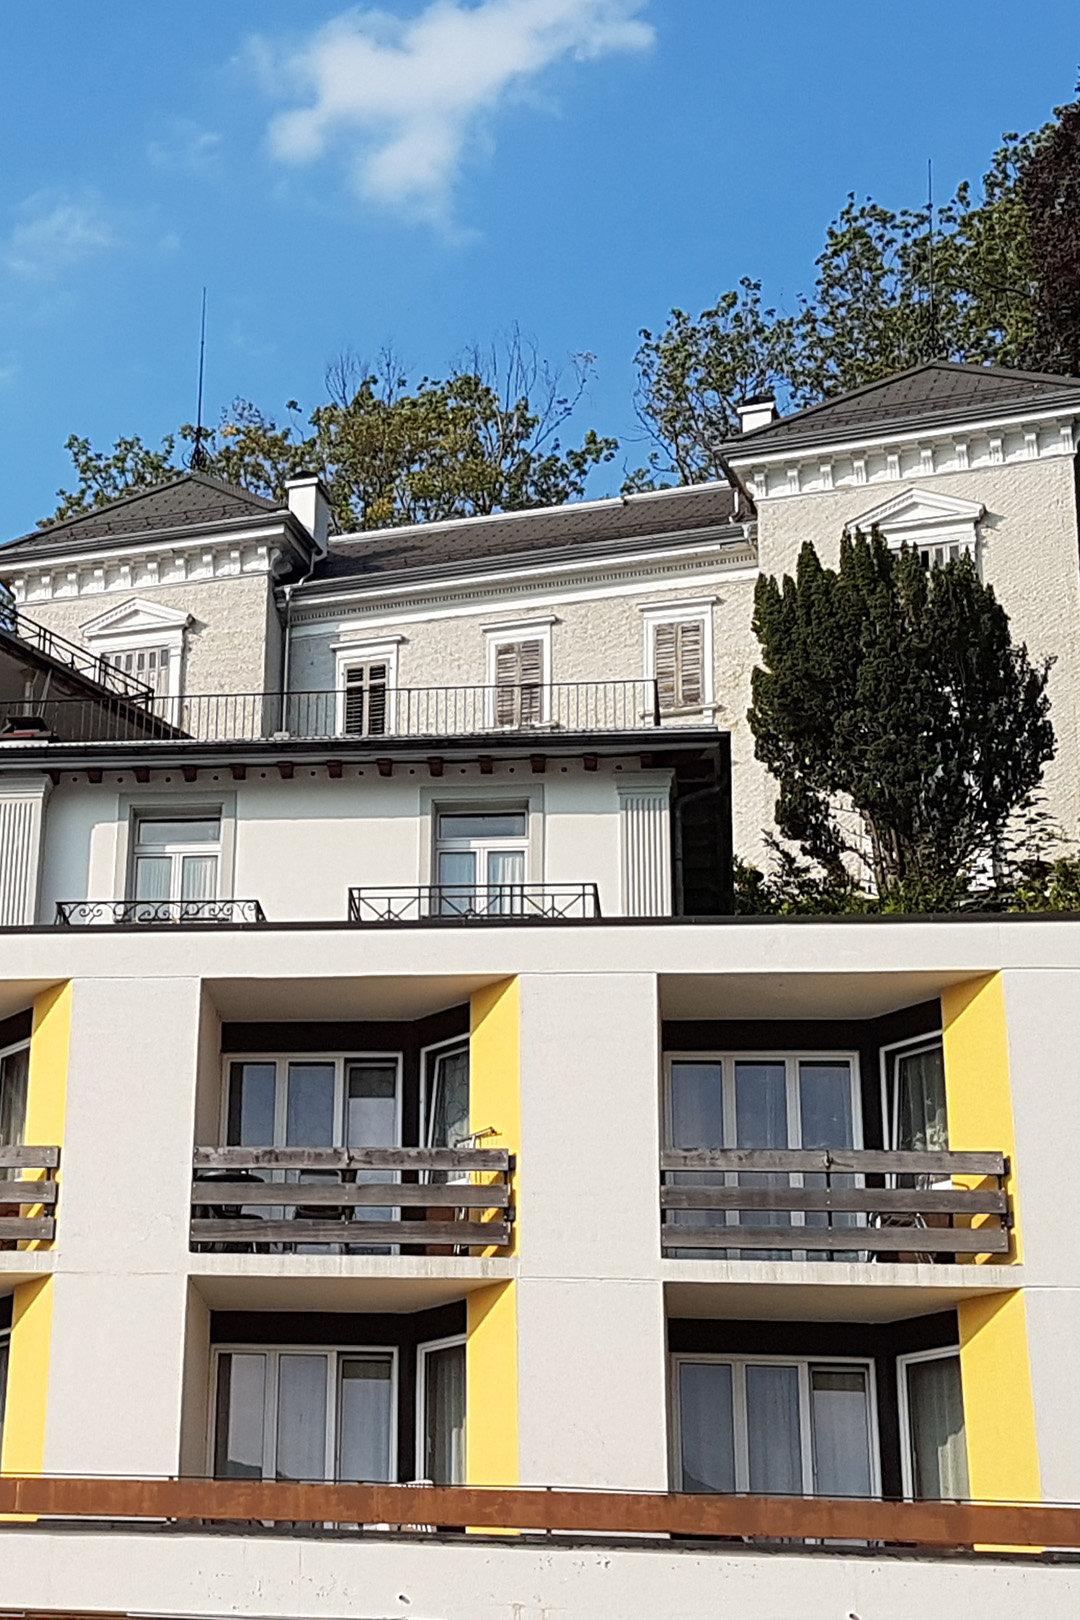 Schoeck Villa and the Othmar Schoeck Memorial